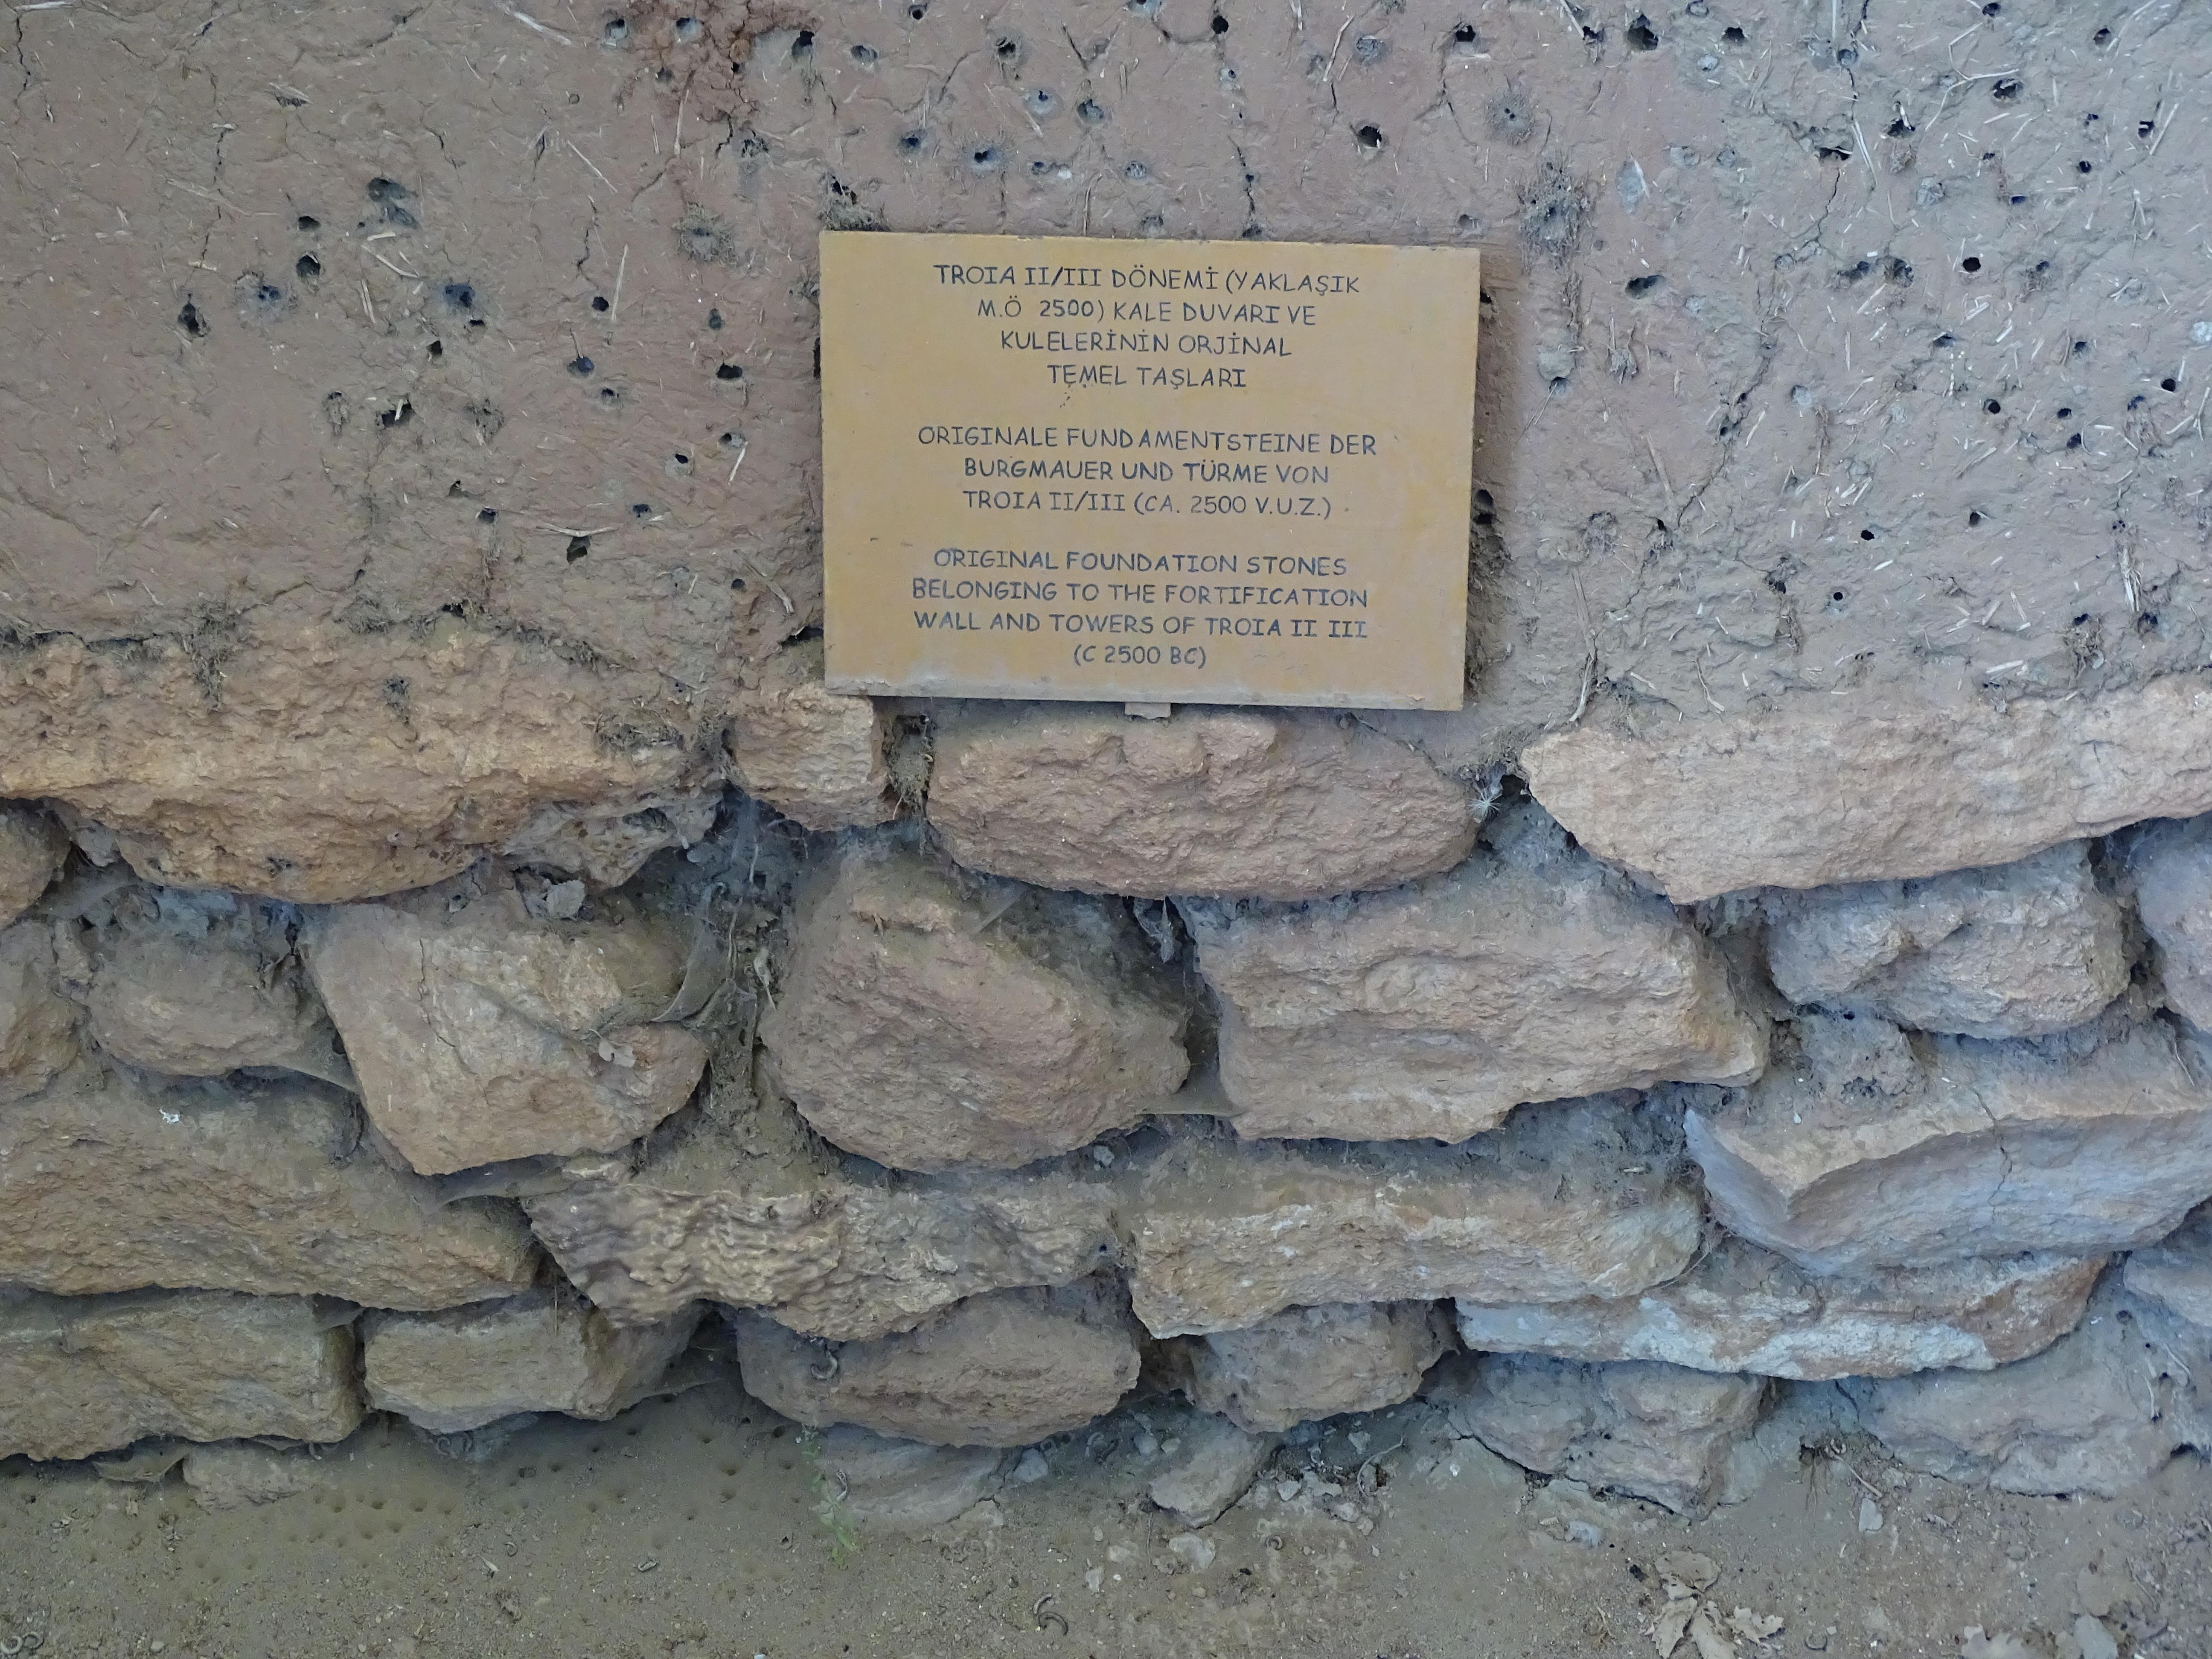 pergamum & troy | graham & julie's visit to amazing places